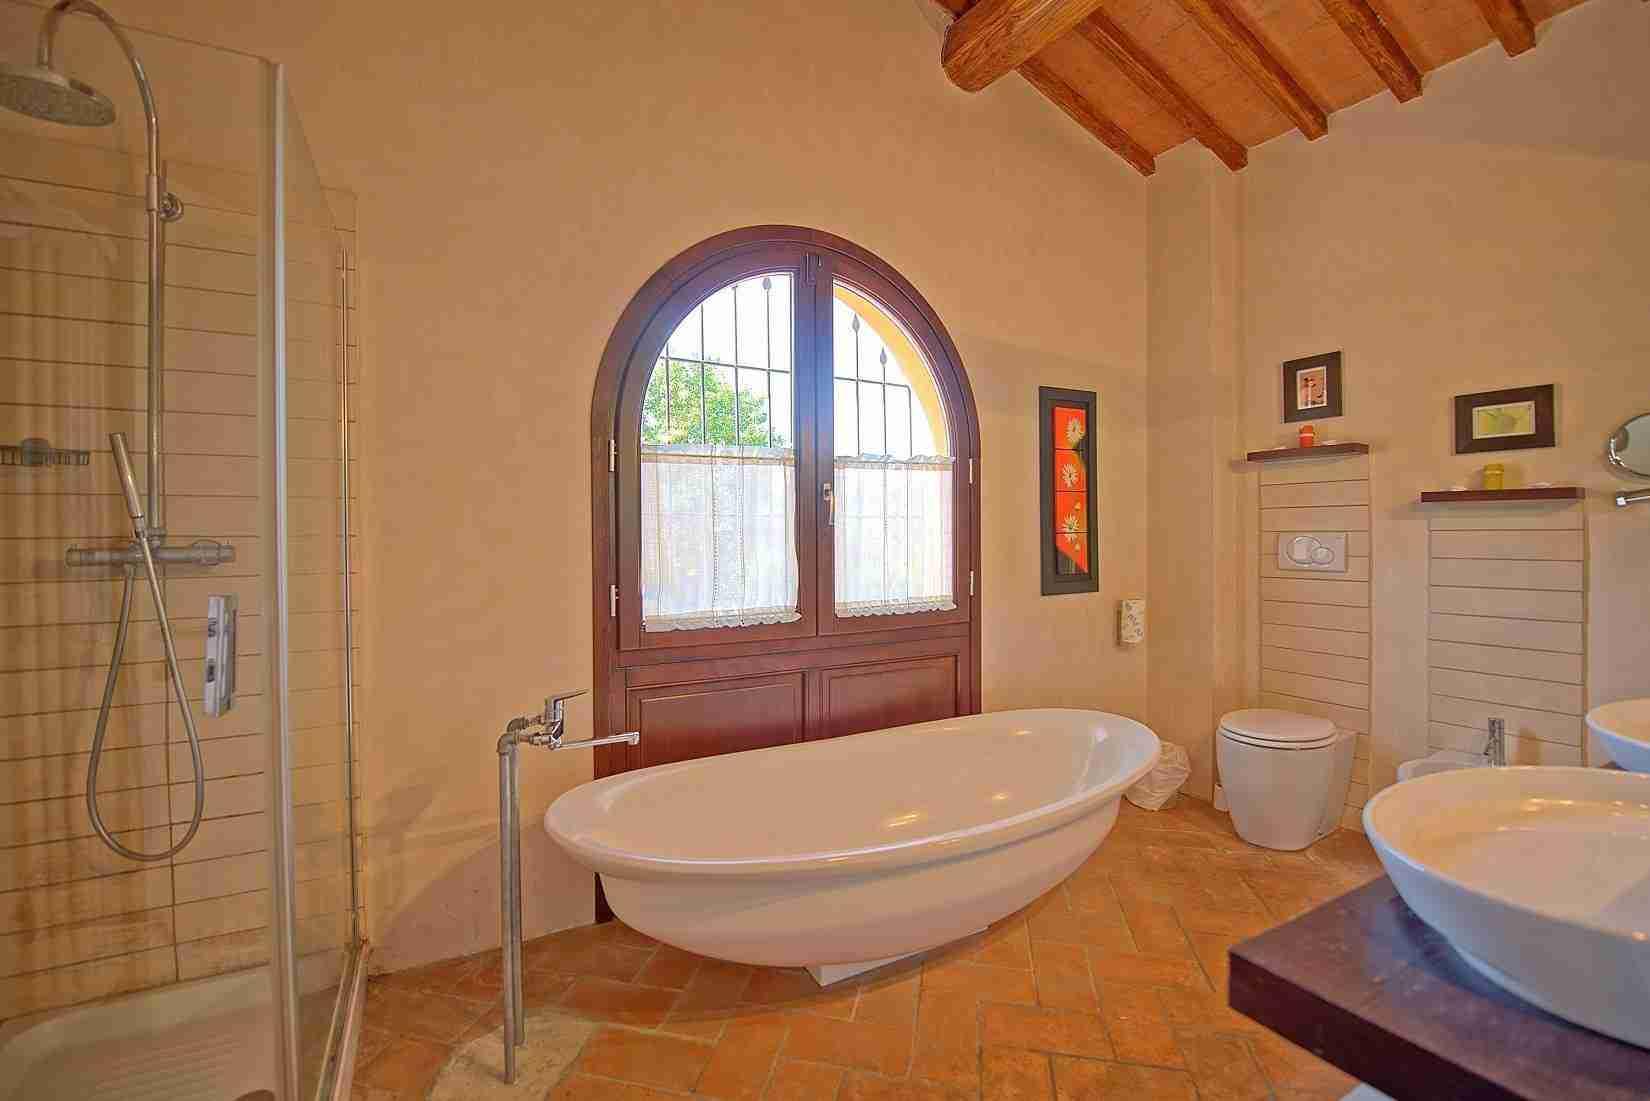 21 Ranieri bathroom